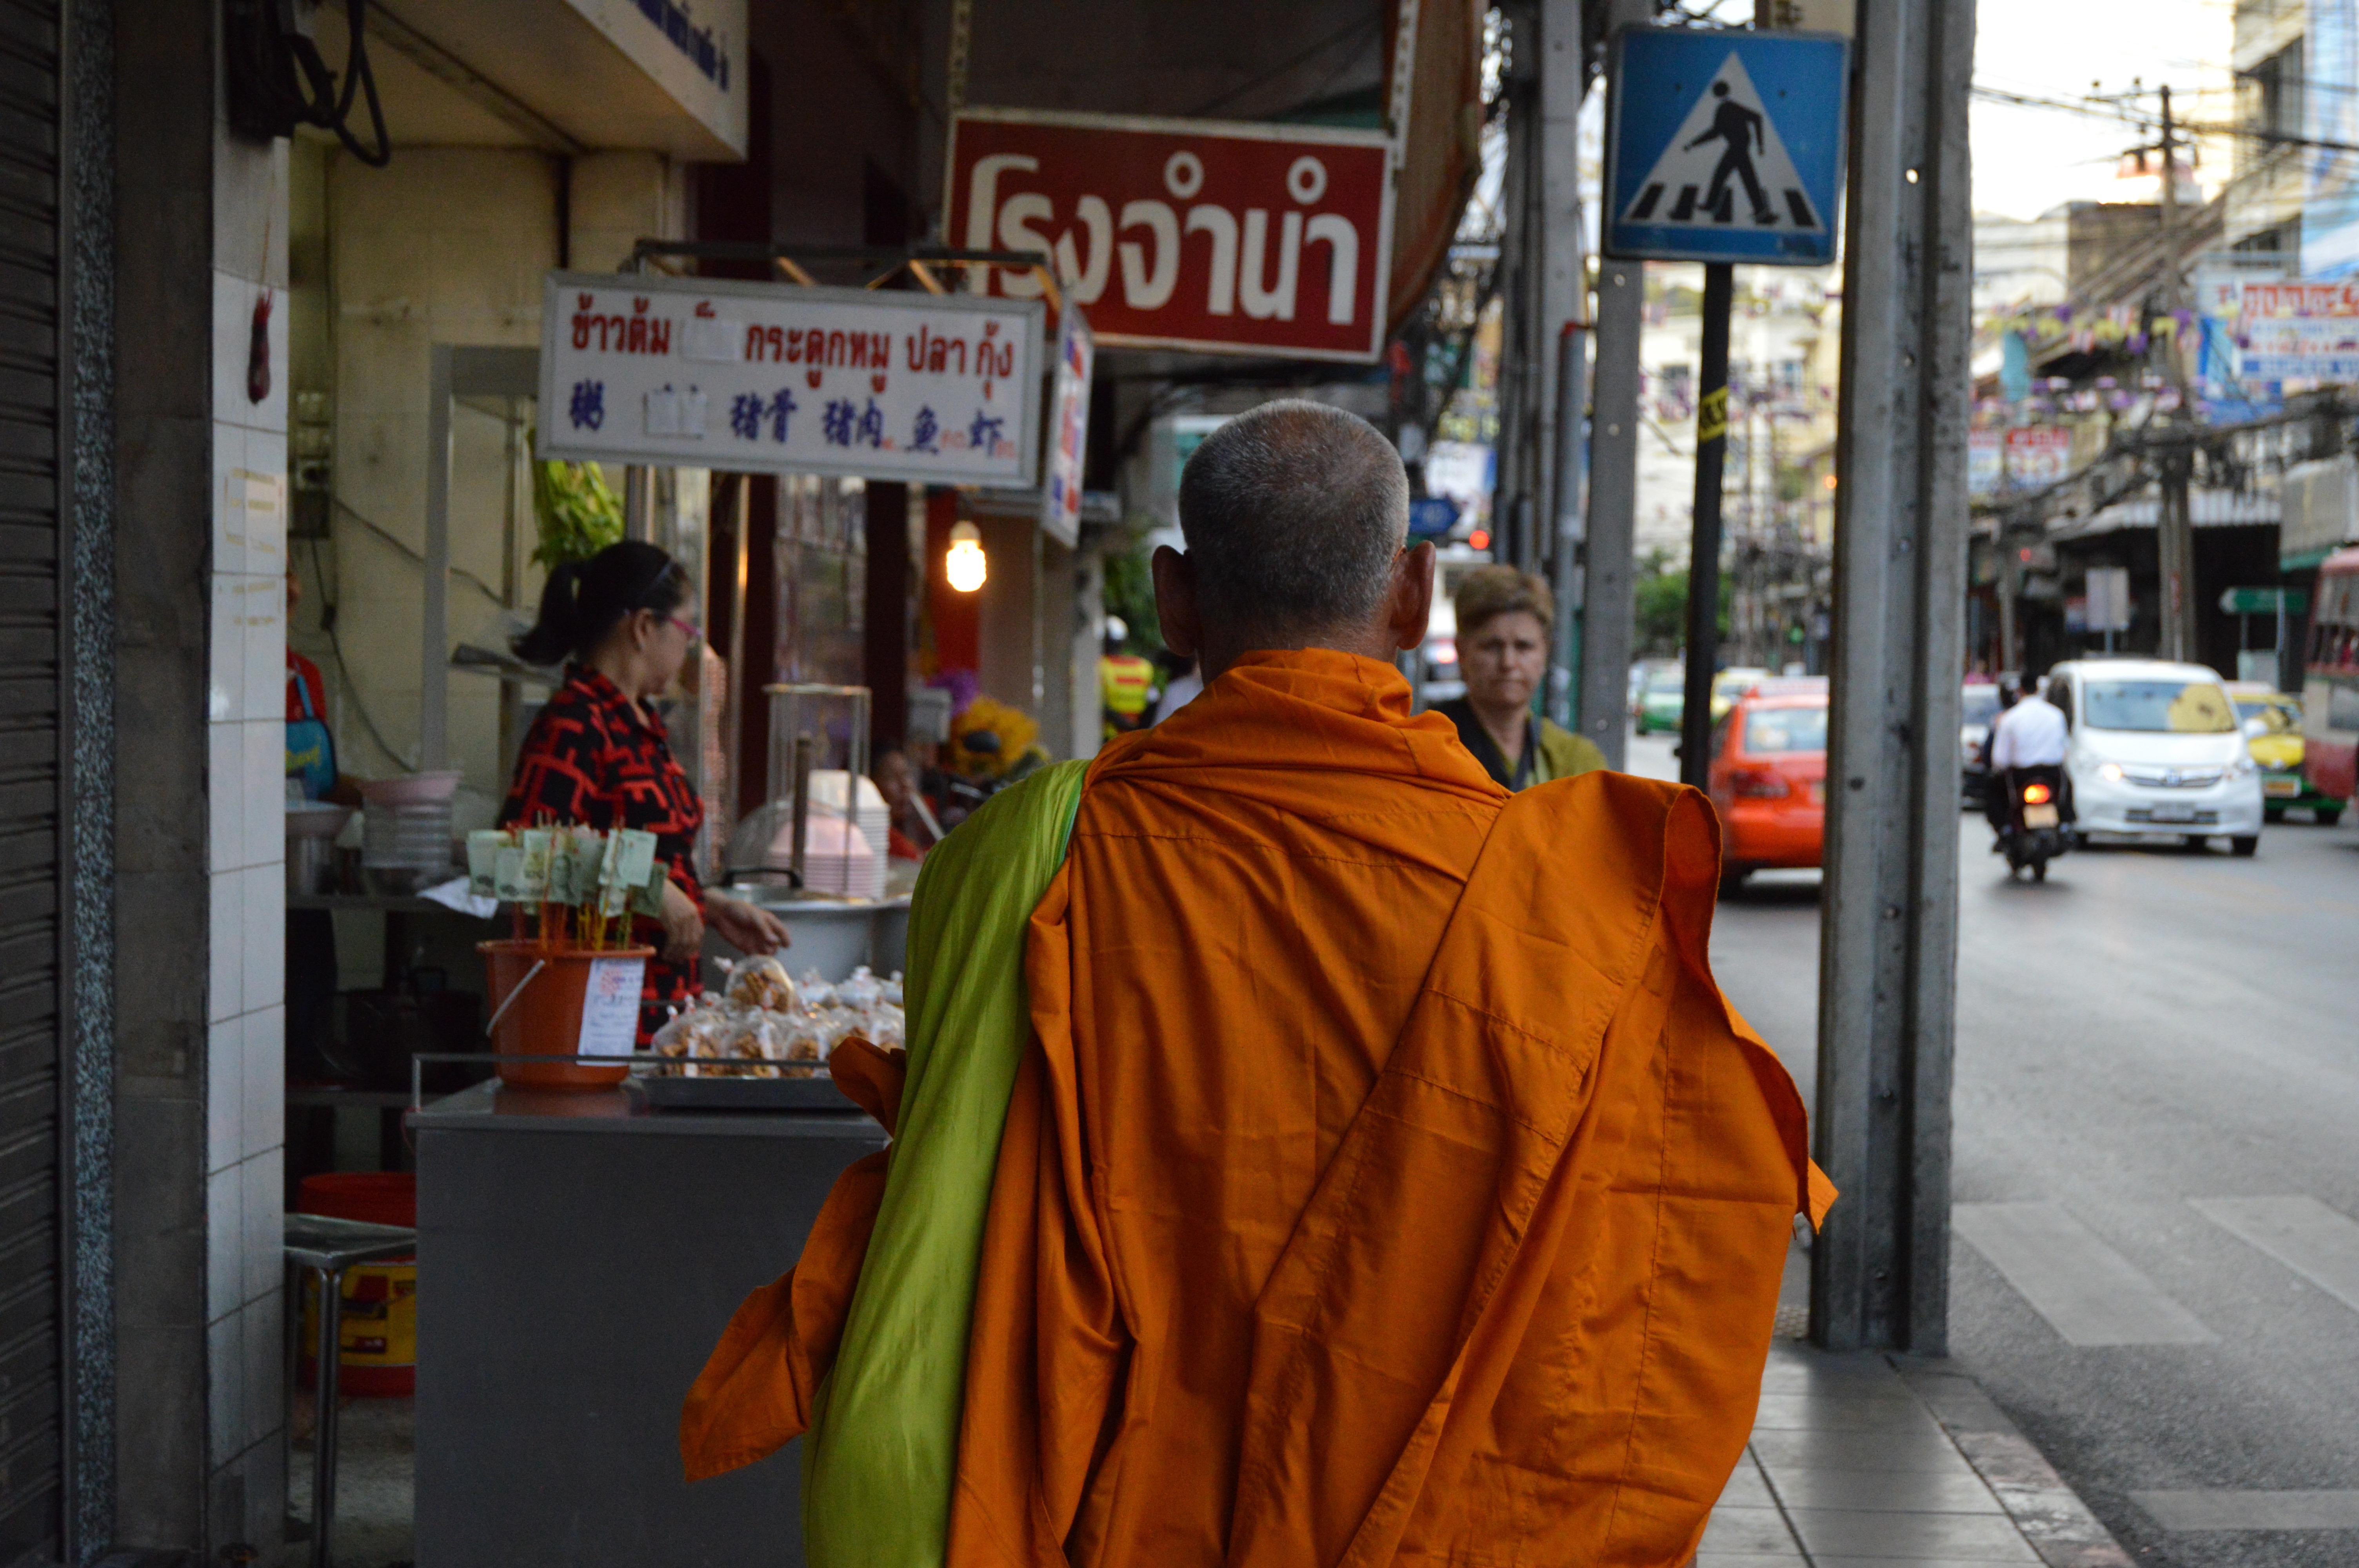 A monk walking down a street in Bangkok.